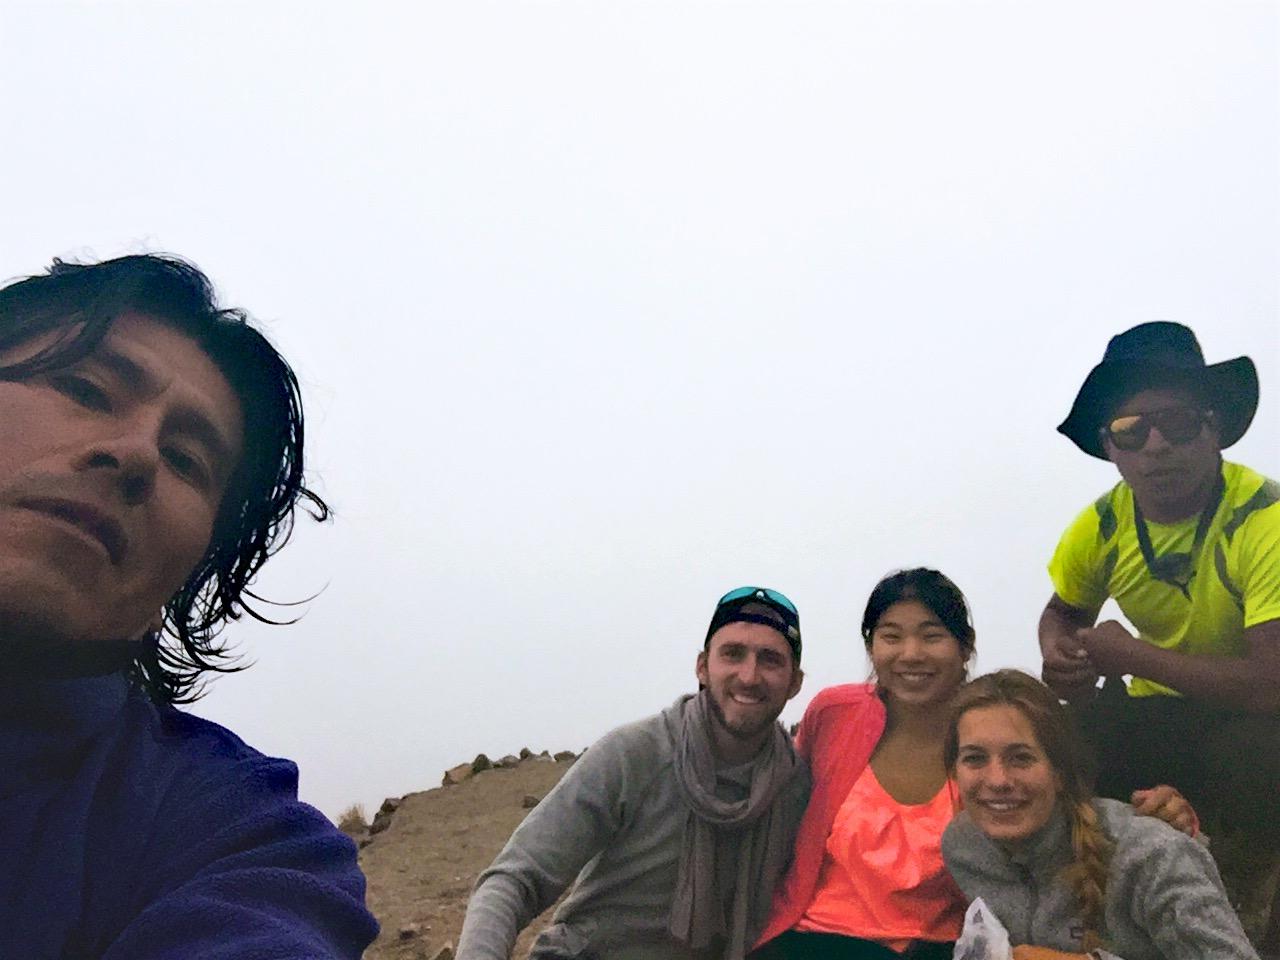 Selfie at Base Camp